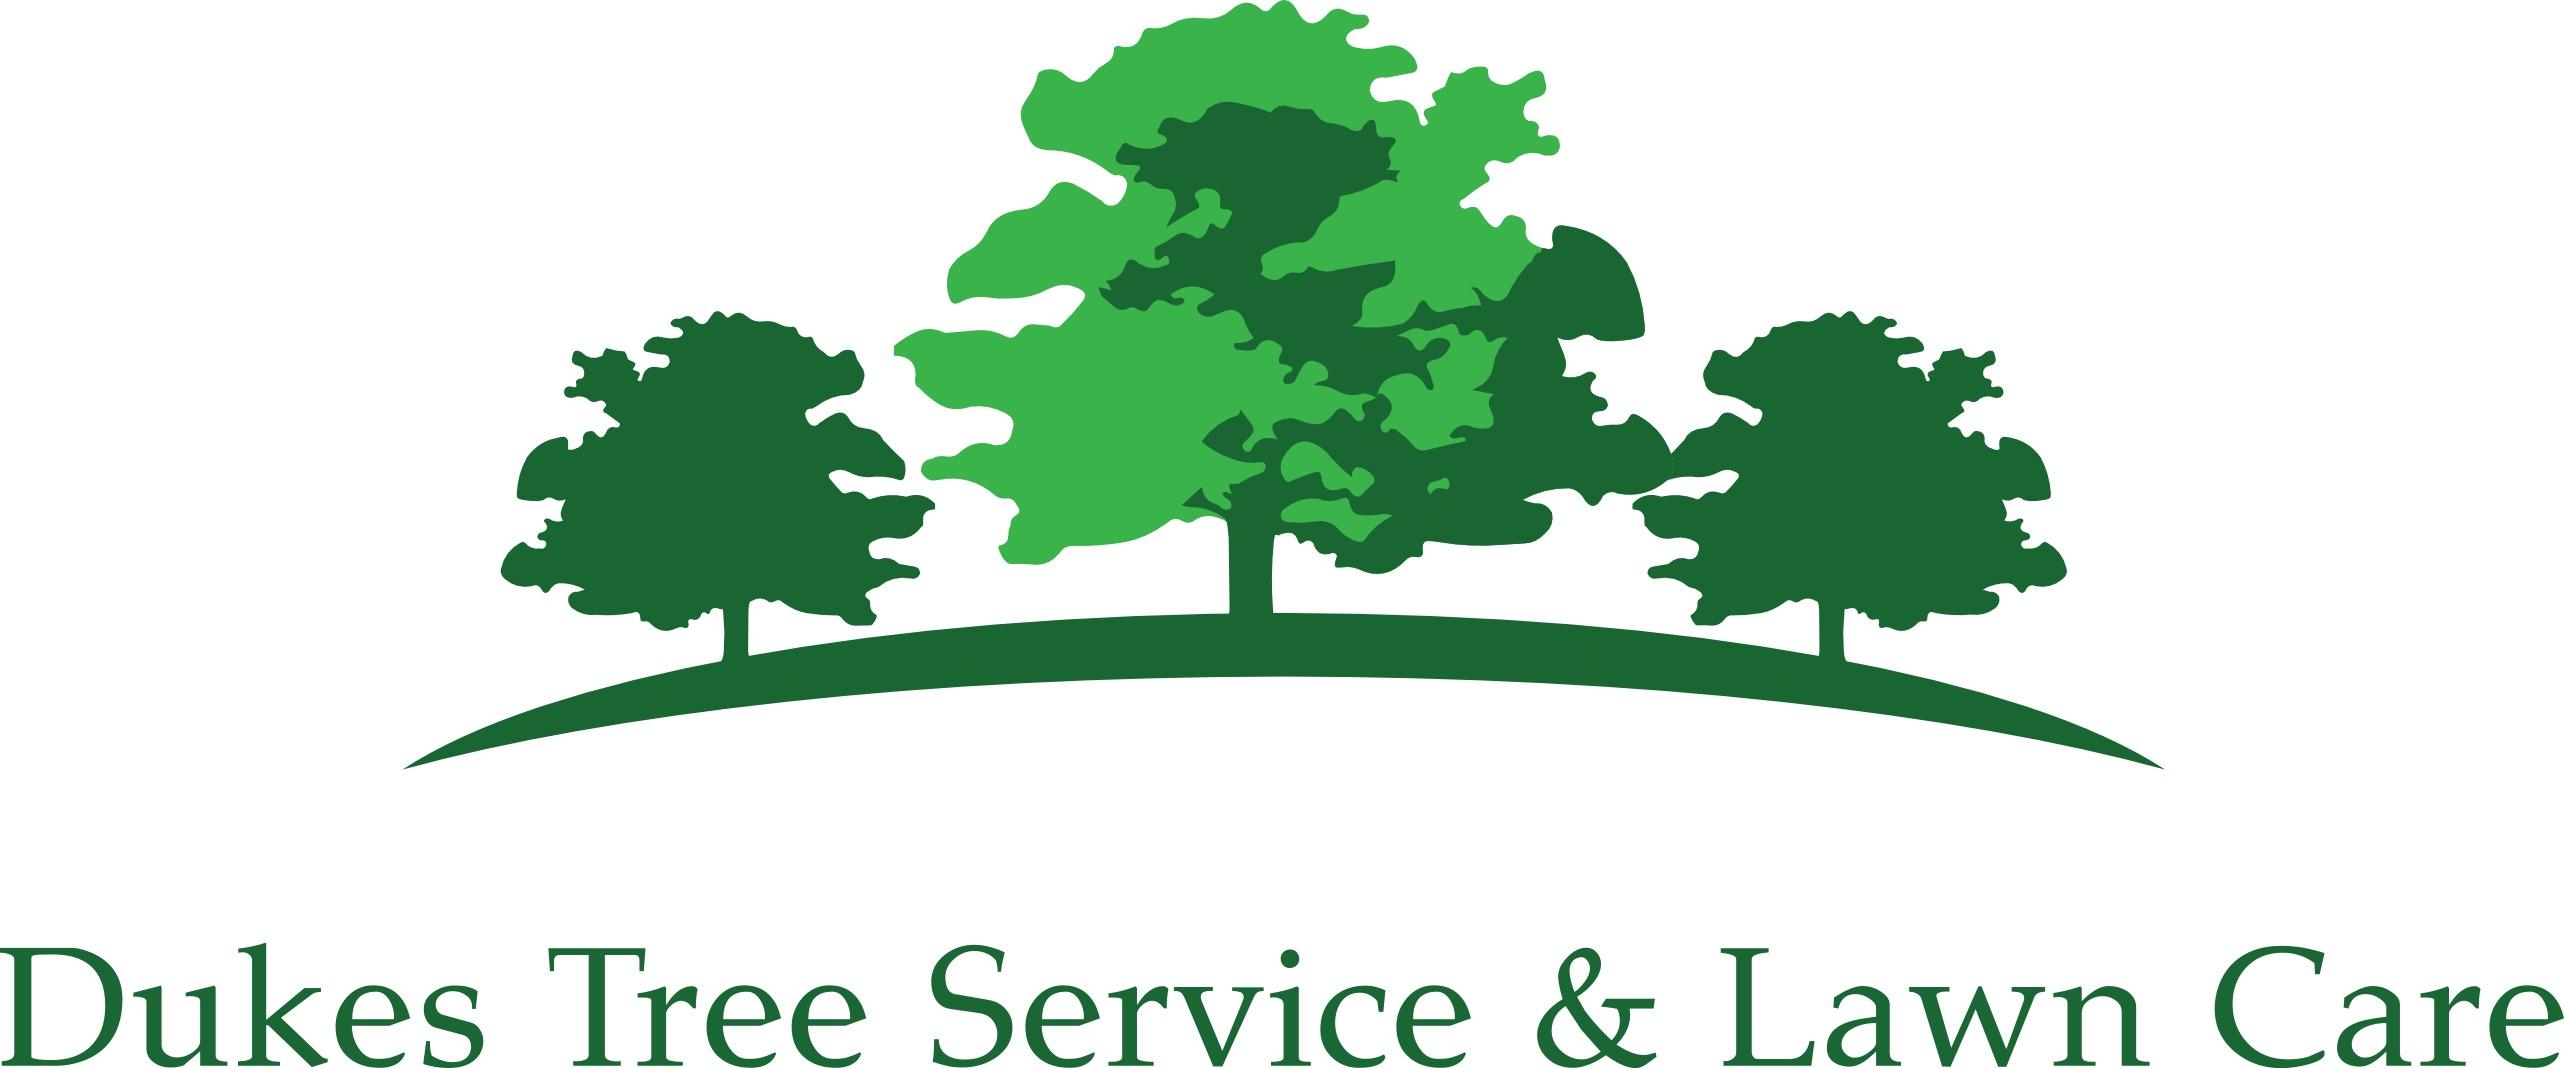 2564x1068 Dukes Tree Service Amp Lawn Care